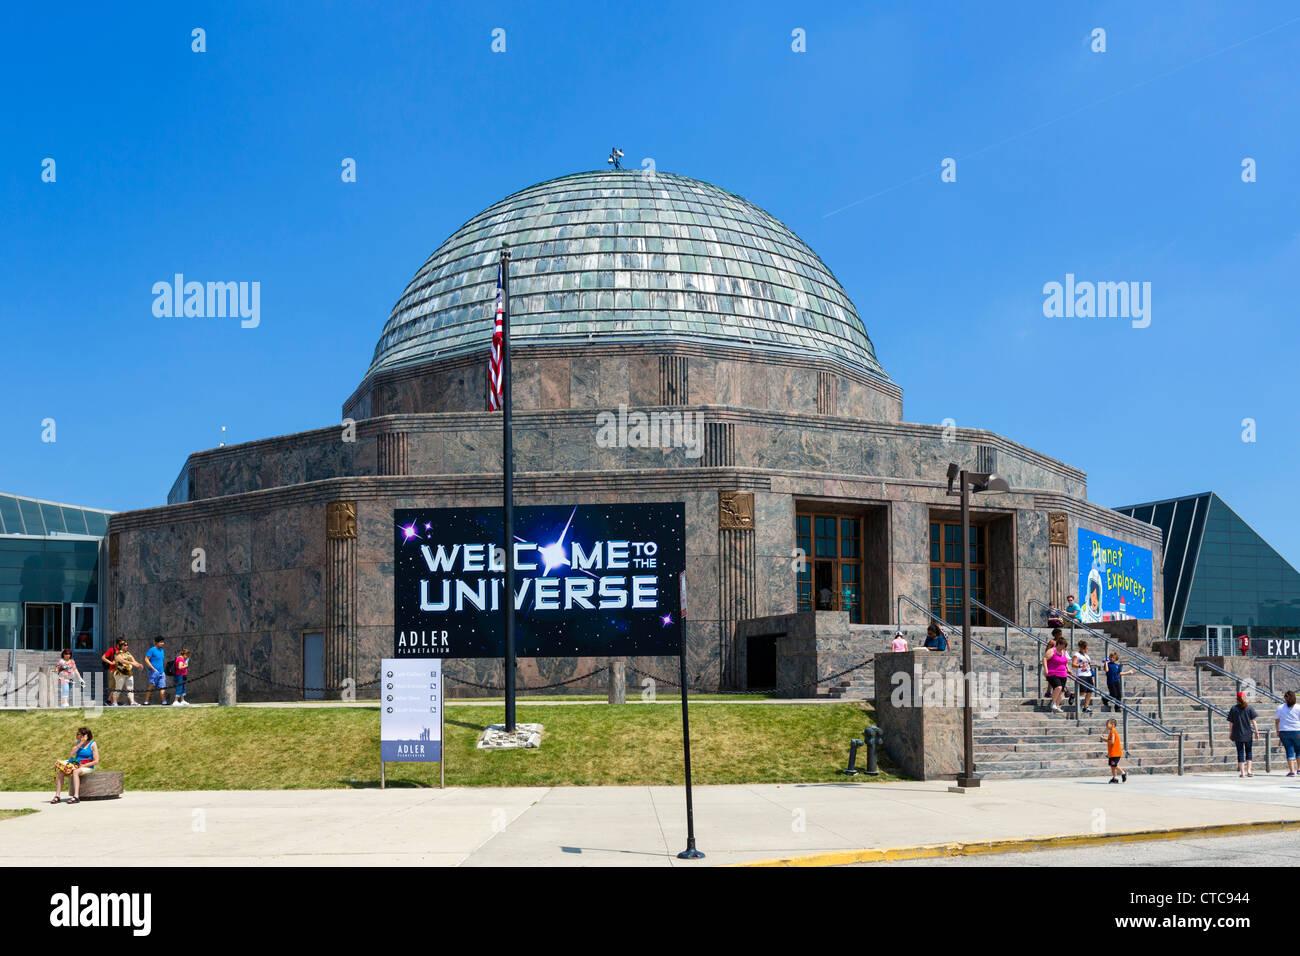 The Adler Planetarium on the Museum Campus in Grant Park, Chicago, Illinois, USA - Stock Image